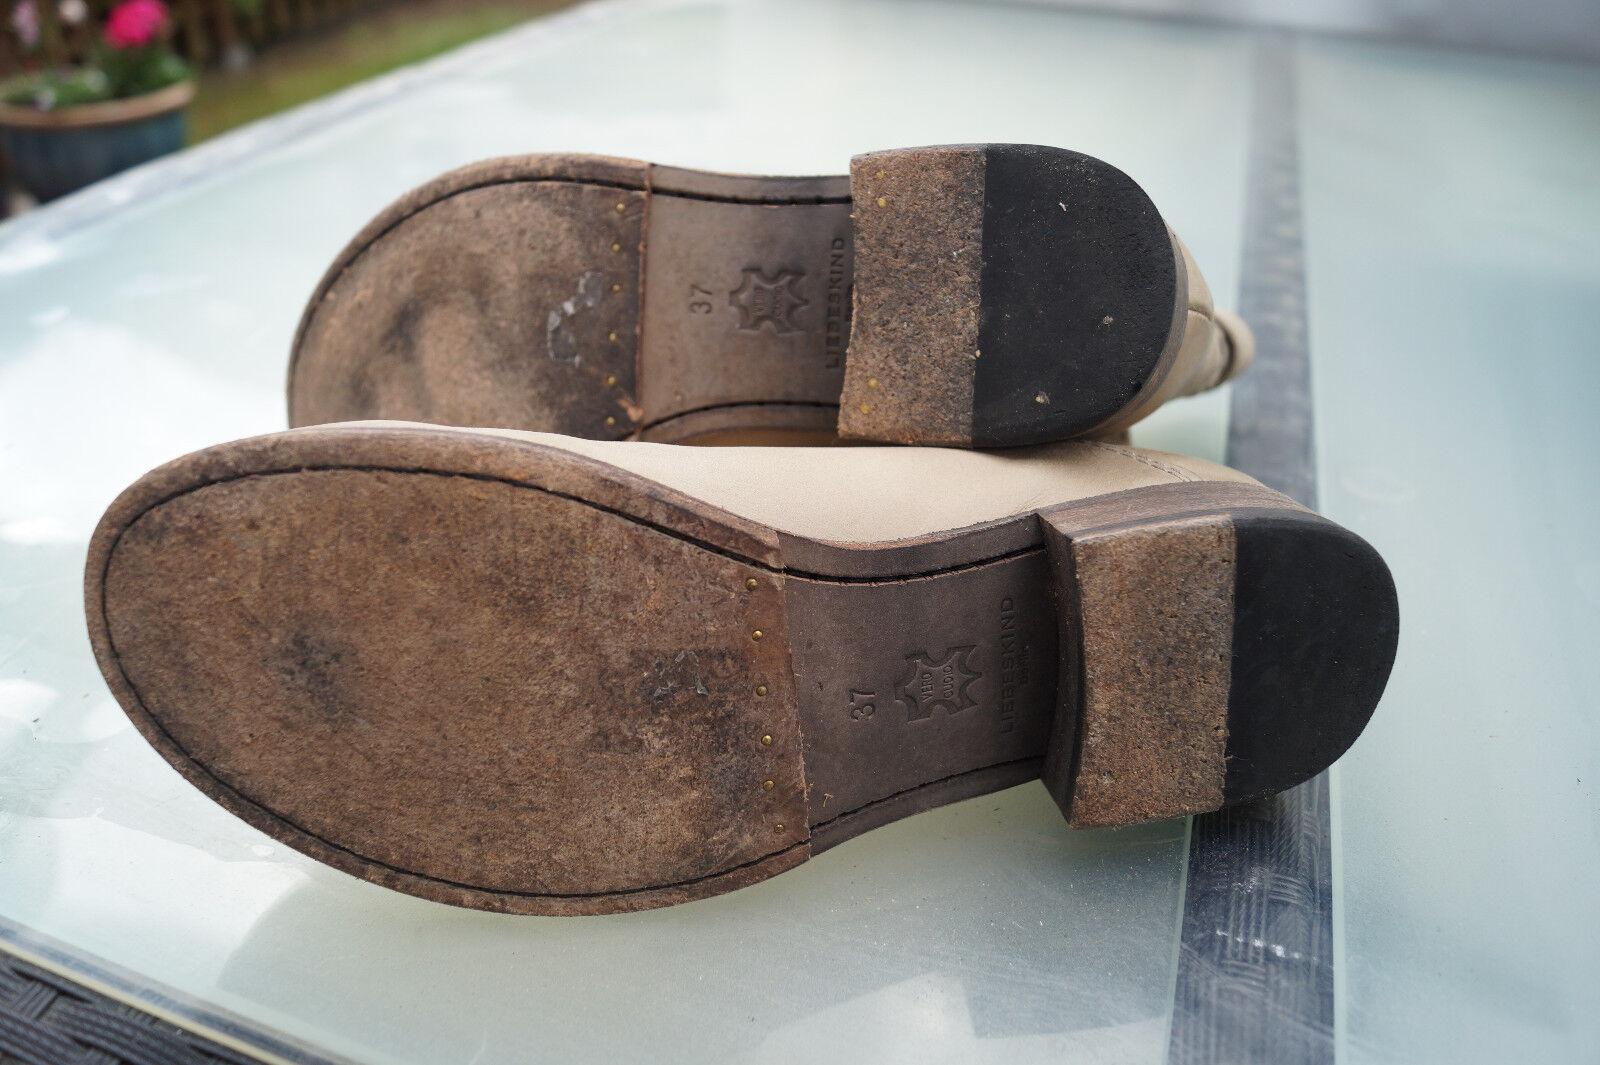 buy popular d08cc 5d9fe ... Skechers for Work Blais-EBZ Steel-Toe Hiking Hiking Hiking Shoe 8d15e9  ...